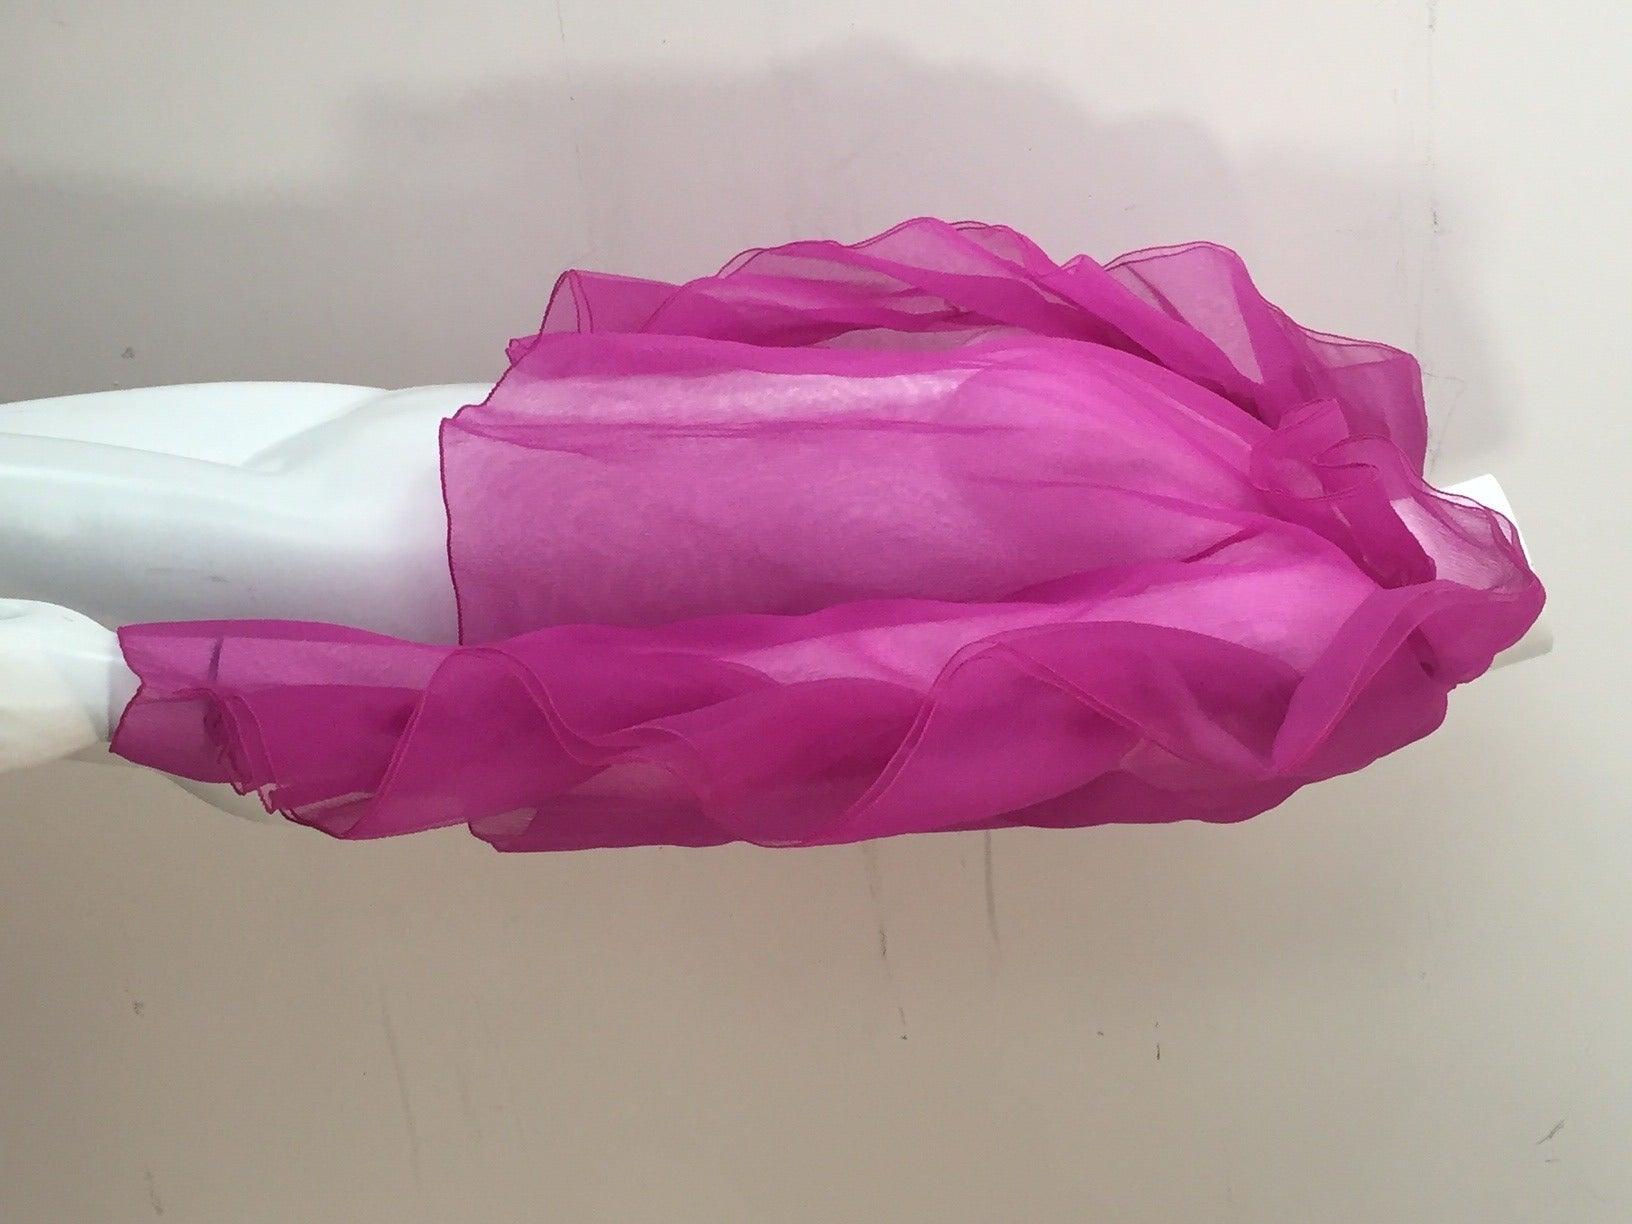 1980s Fuchsia Organza Ruffled-Sleeve Blouse 2